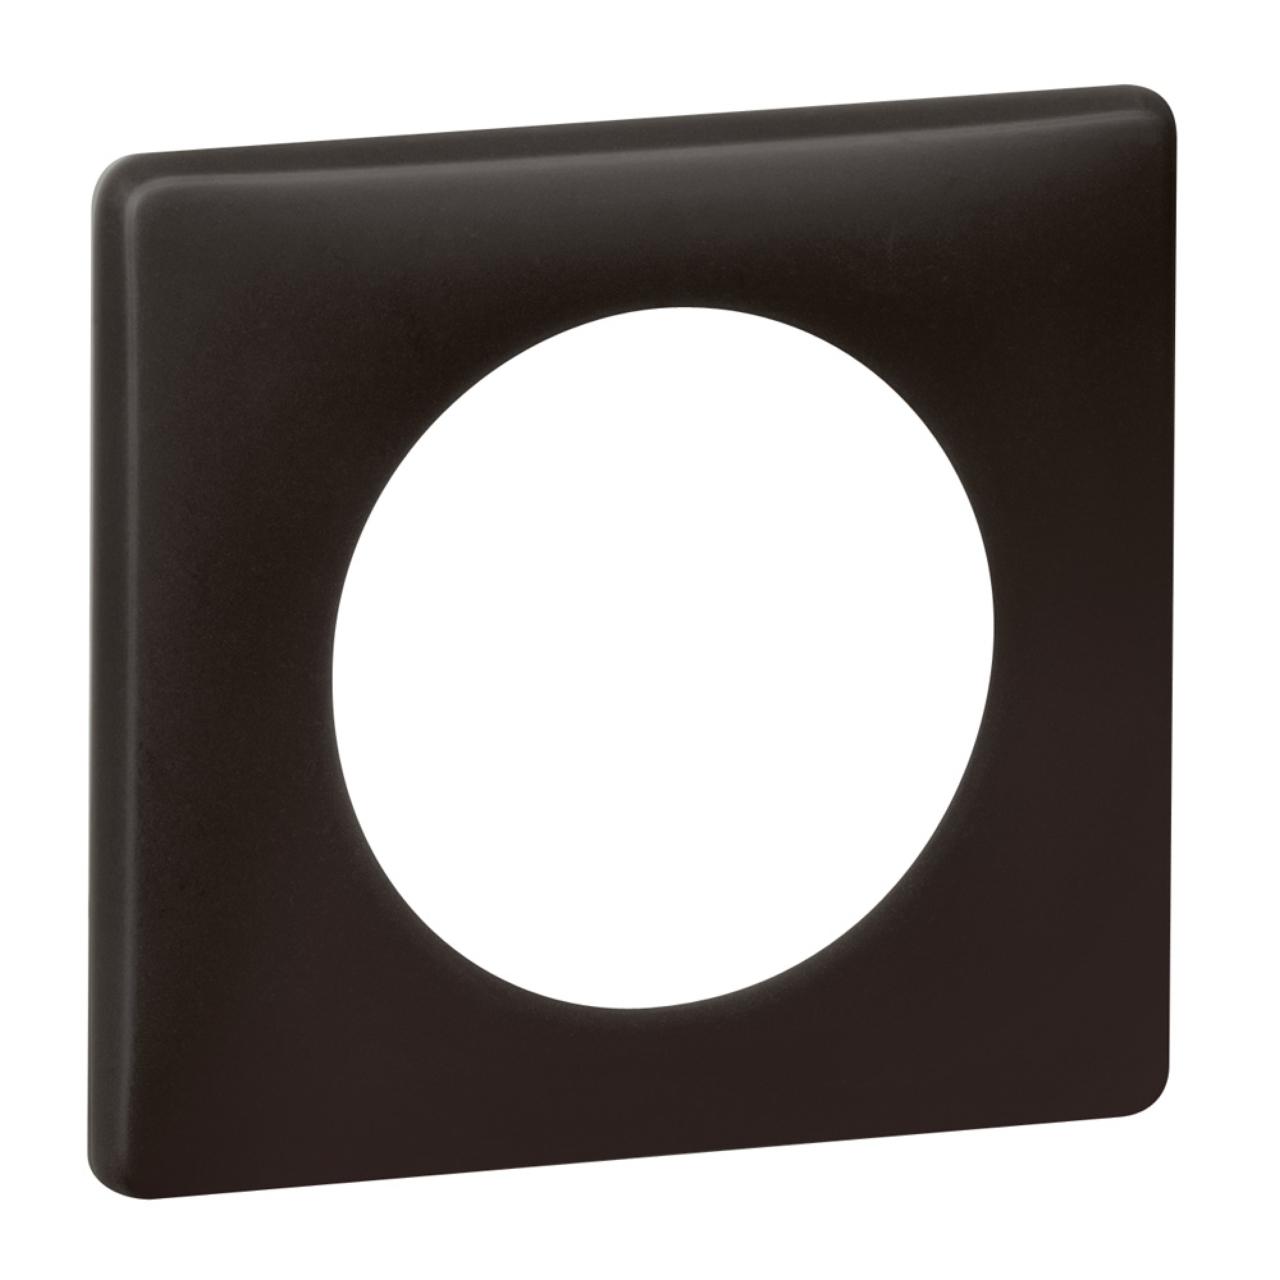 plaque legrand c liane 1 poste basalte 4 96. Black Bedroom Furniture Sets. Home Design Ideas